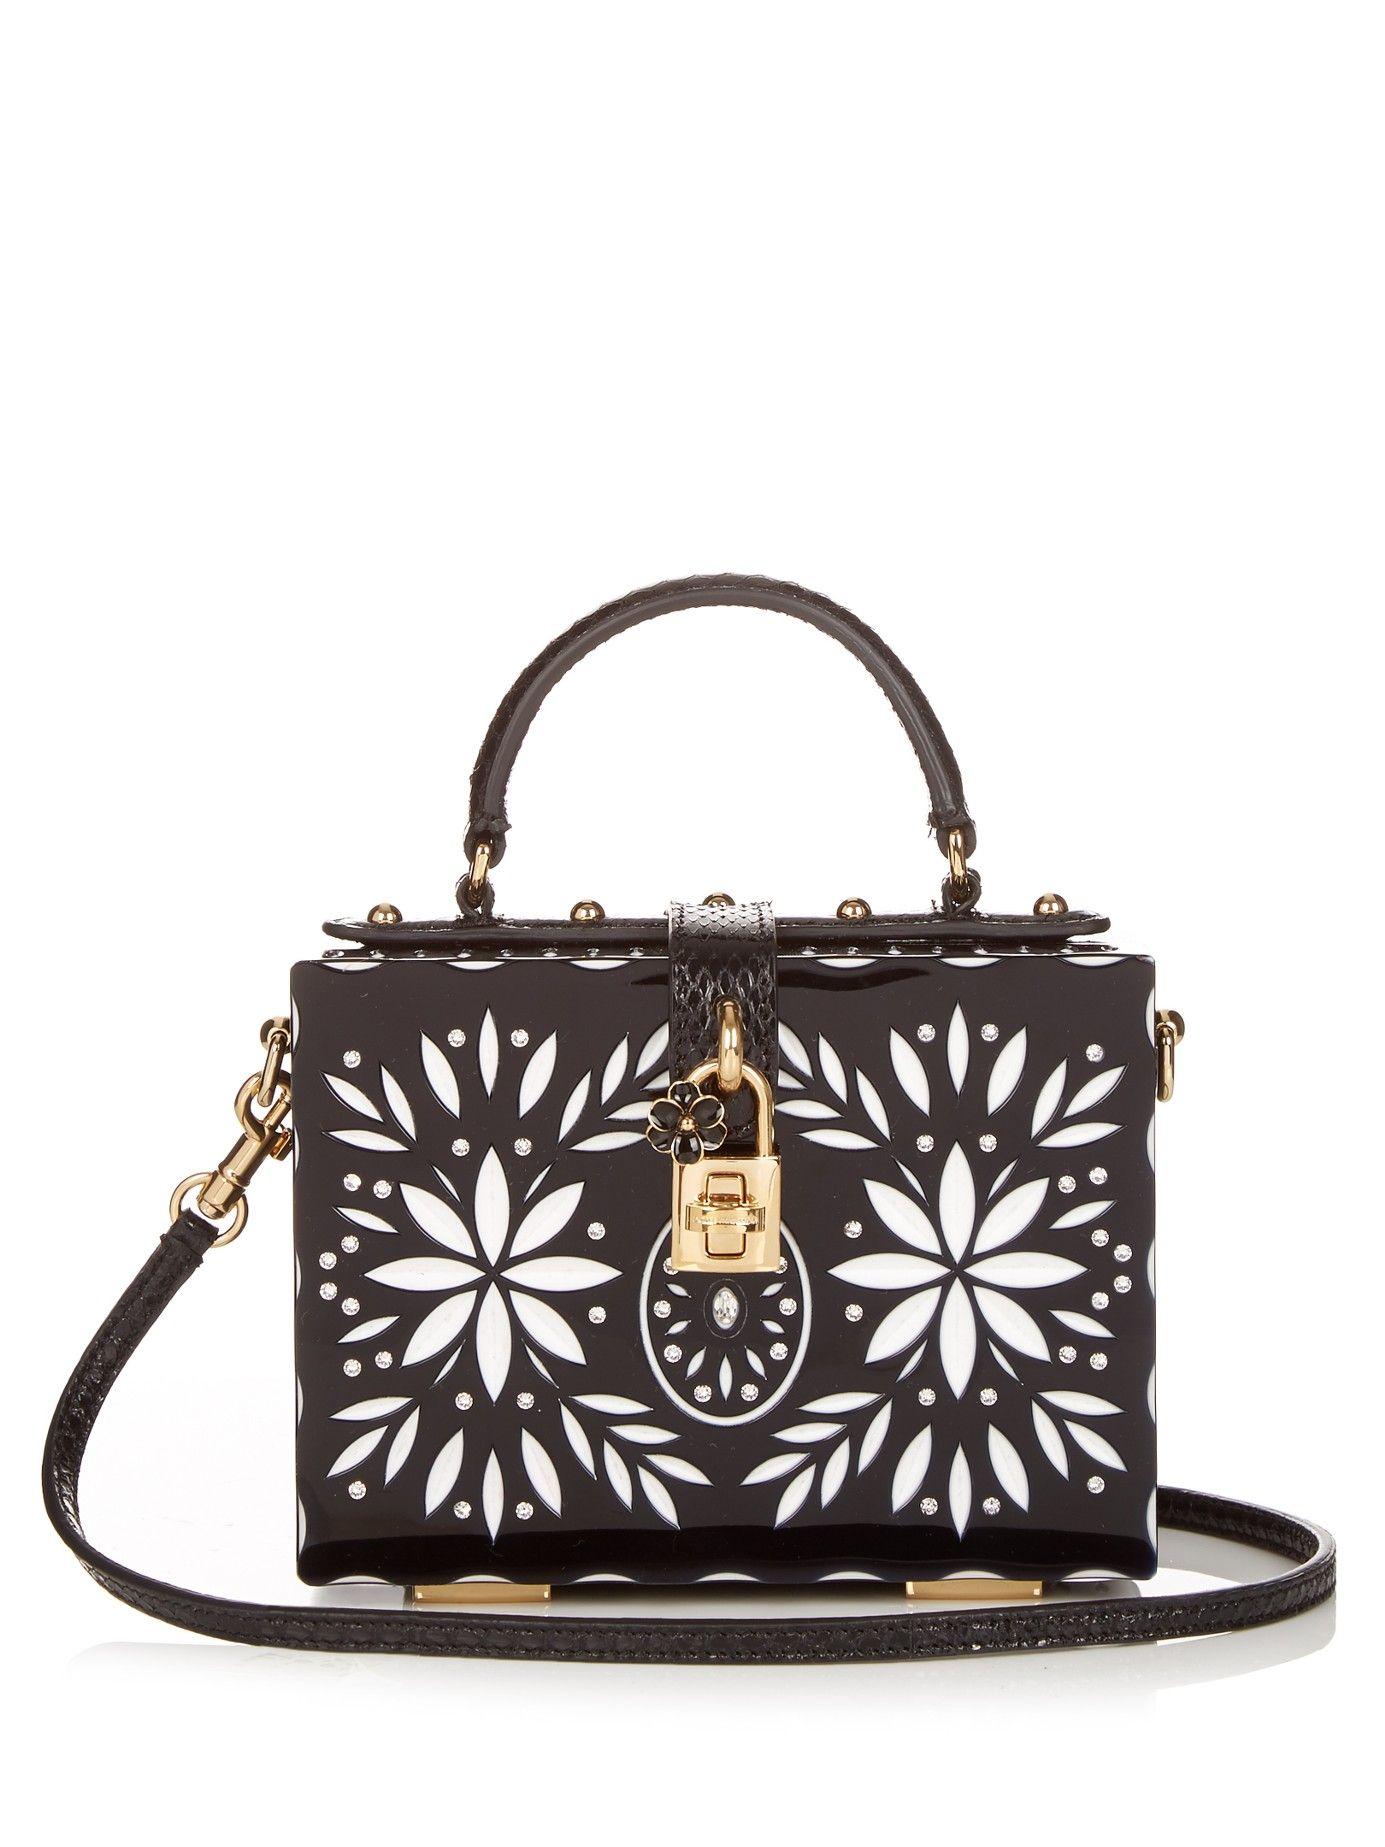 Flower-debossed Plexiglas box clutch   Dolce & Gabbana   MATCHESFASHION.COM